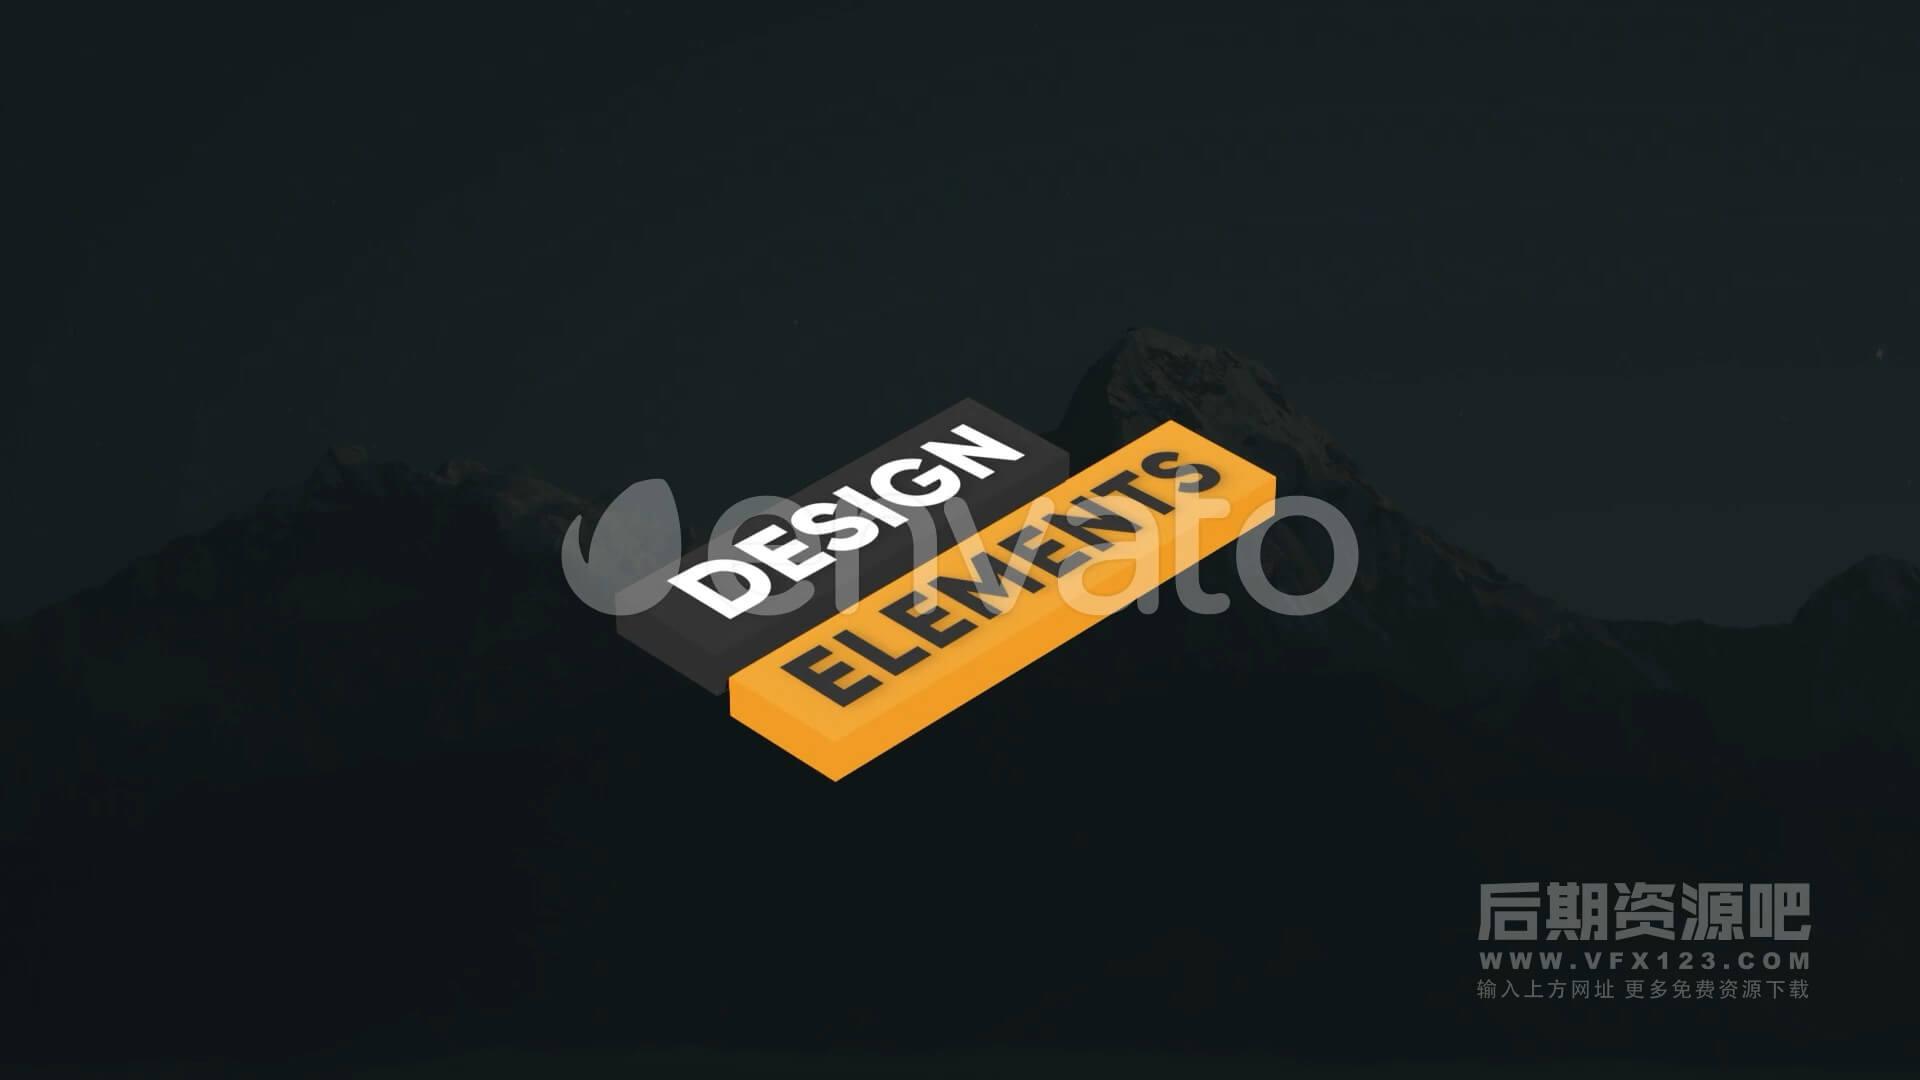 Fcpx标题插件 3D立体标题制作工具 第二季 Modern Isometric Titles